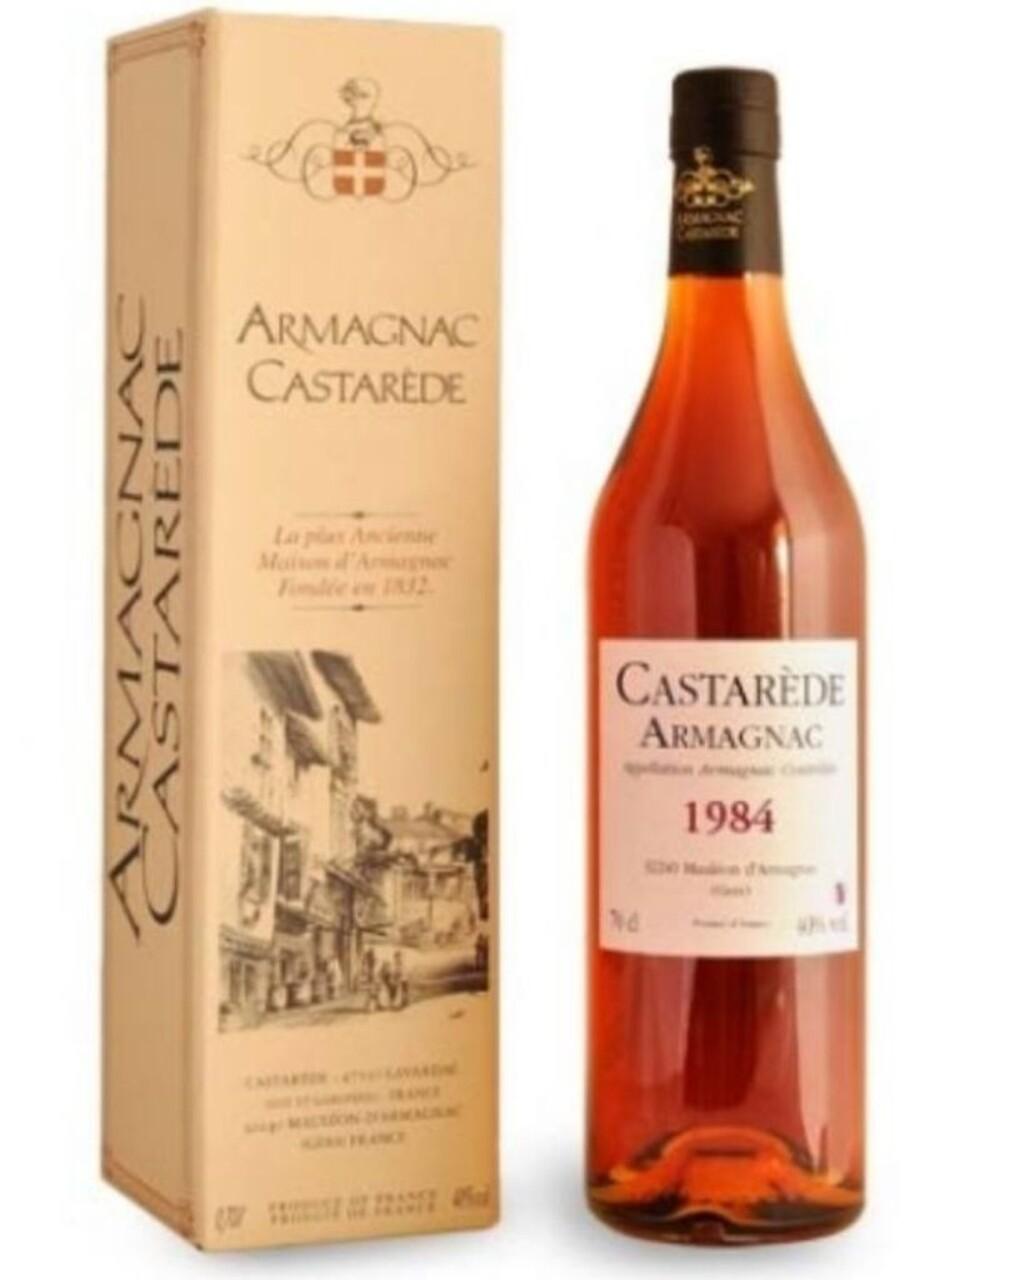 ARMAGNAC CASTAREDE 1984